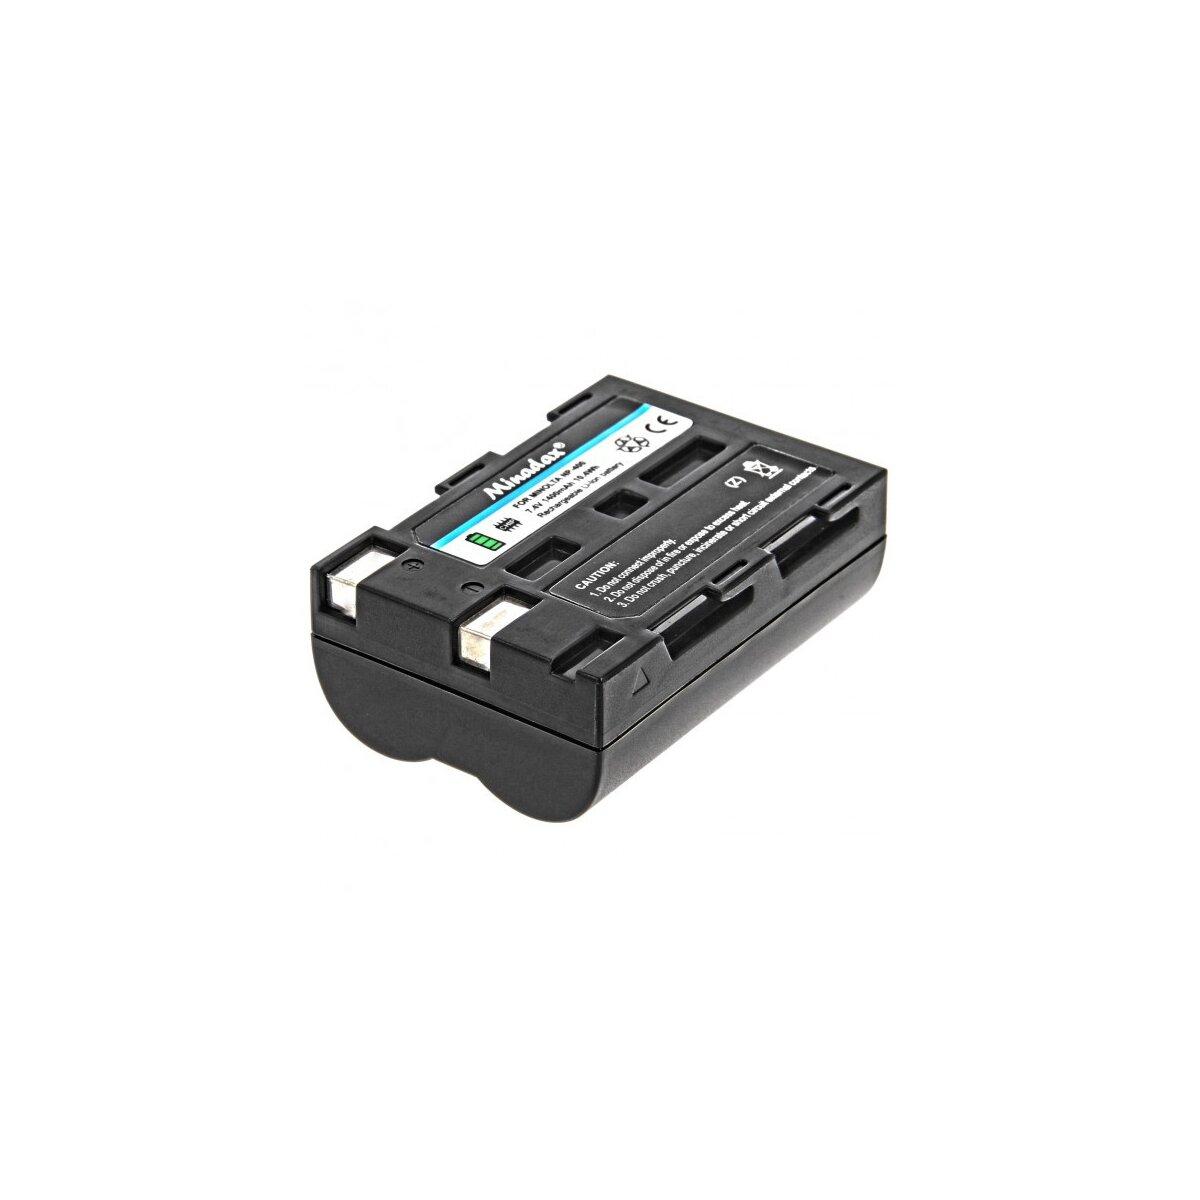 Minadax® Qualitätsakku mit echten 1400 mAh kompatibel mit Pentax K10D, K20D, K100D, K110D, Ersatz für NP-400 - Intelligentes Akkusystem mit Chip